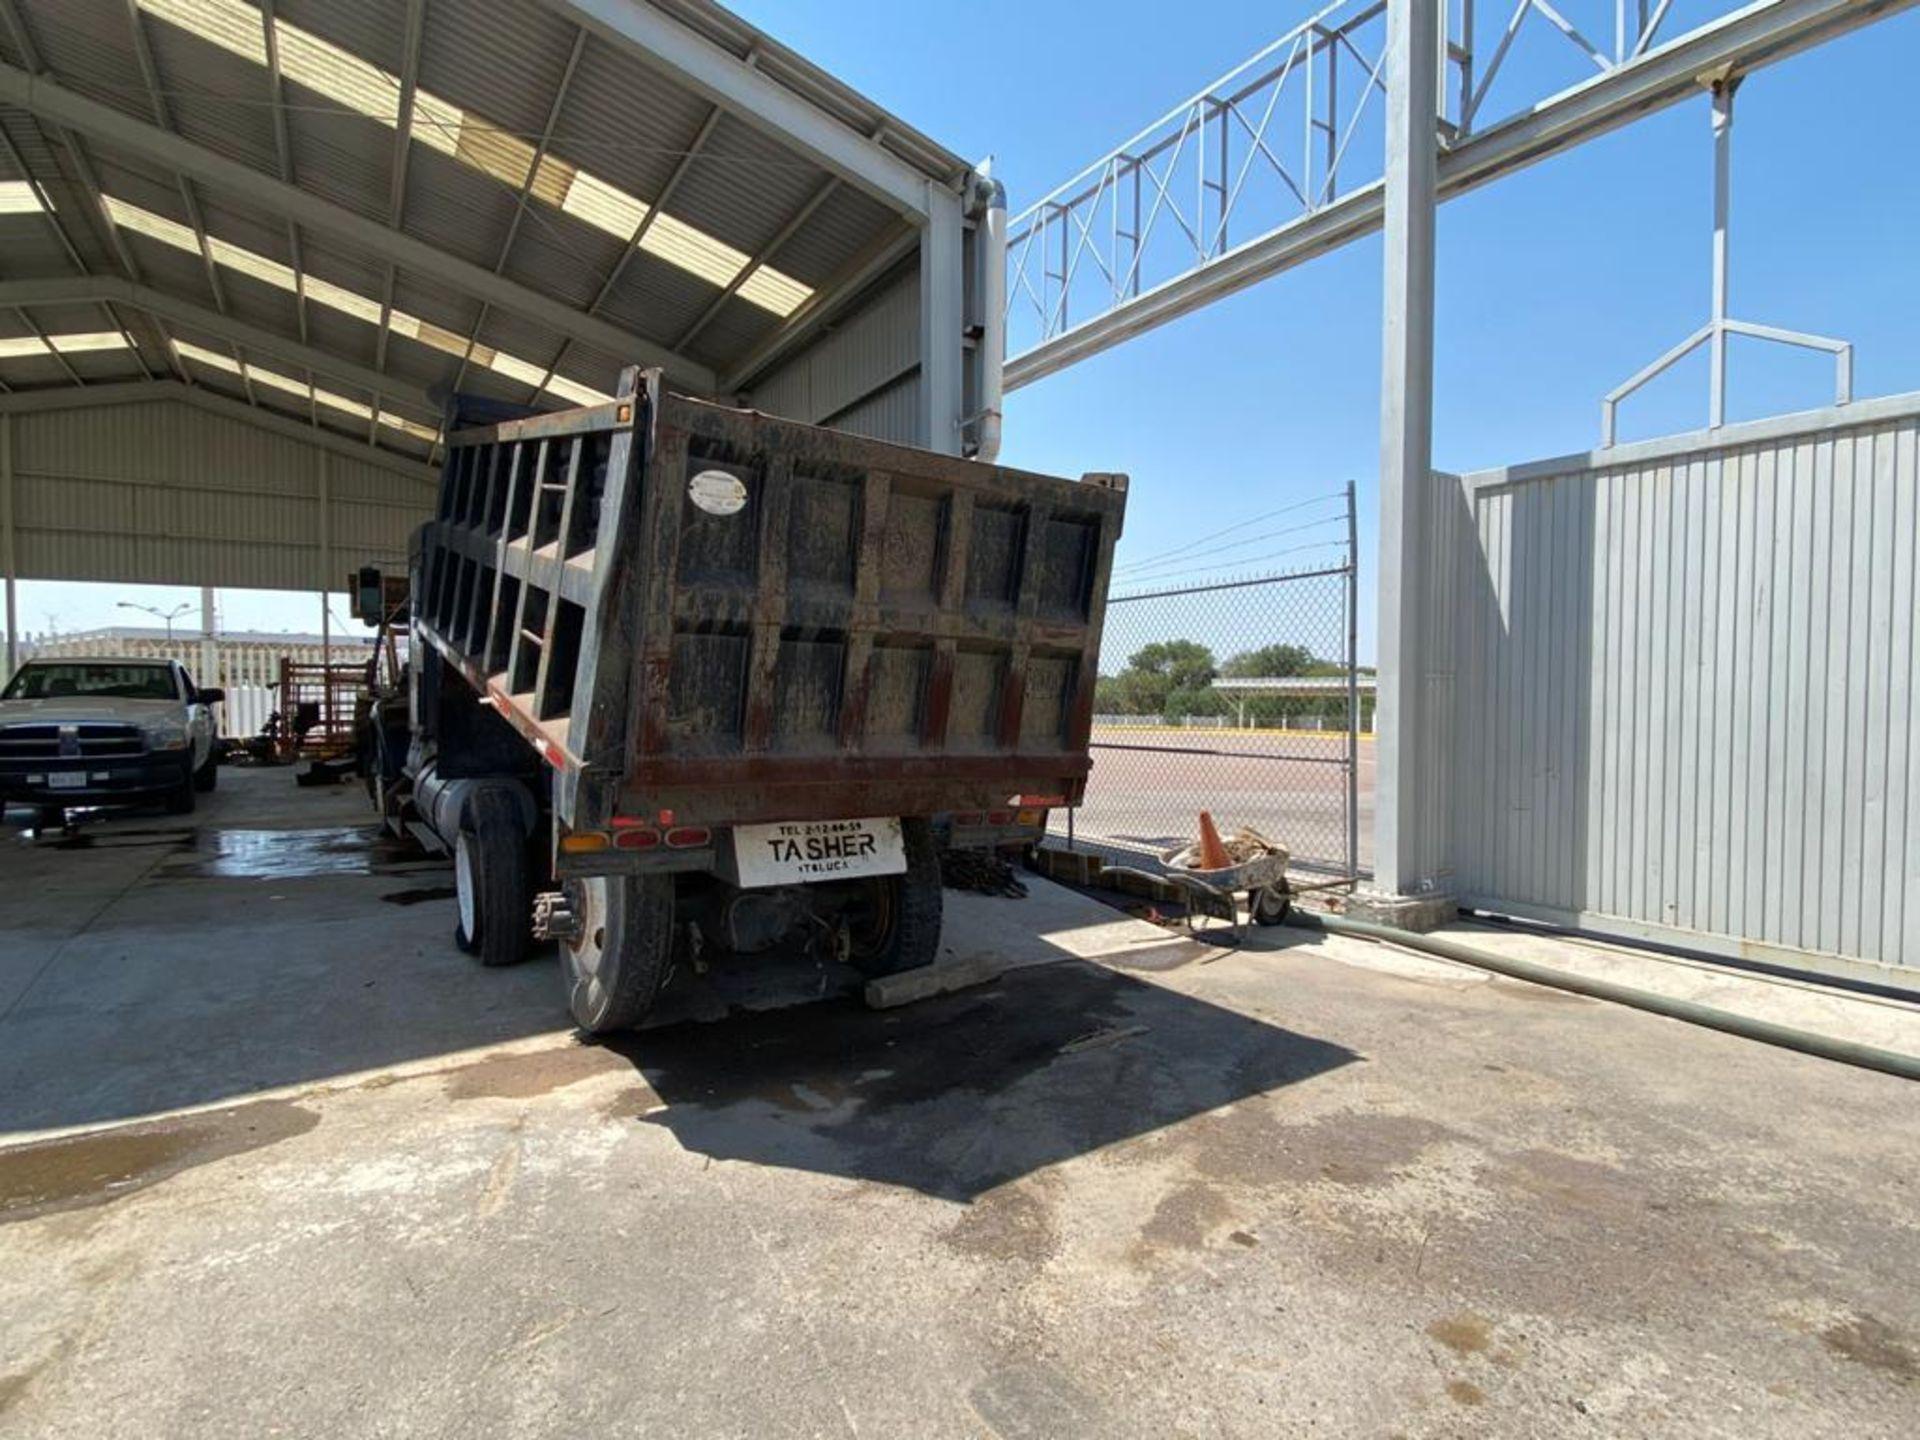 1983 Kenworth Dump Truck, standard transmission of 10 speeds, with Cummins motor - Image 11 of 68